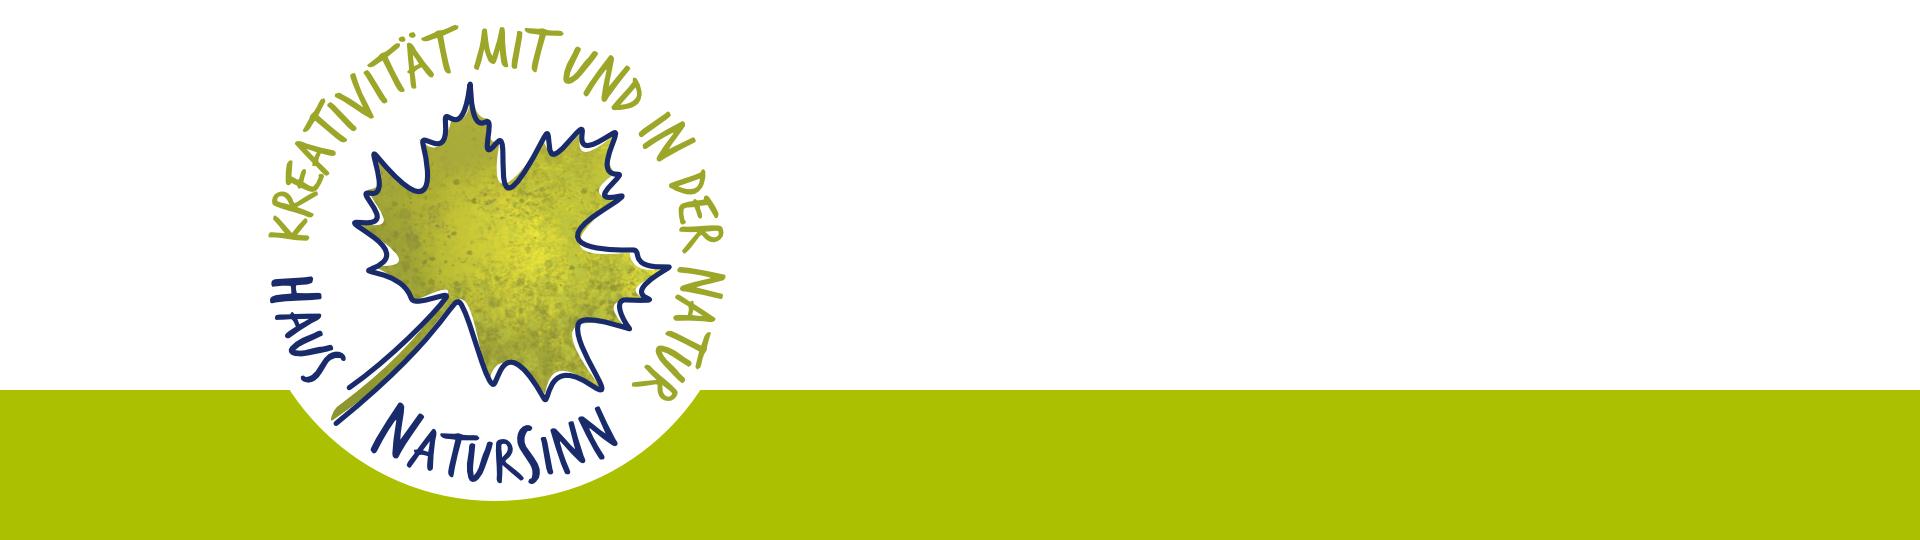 "Logoentwicklung für ""Haus NaturSinn"""